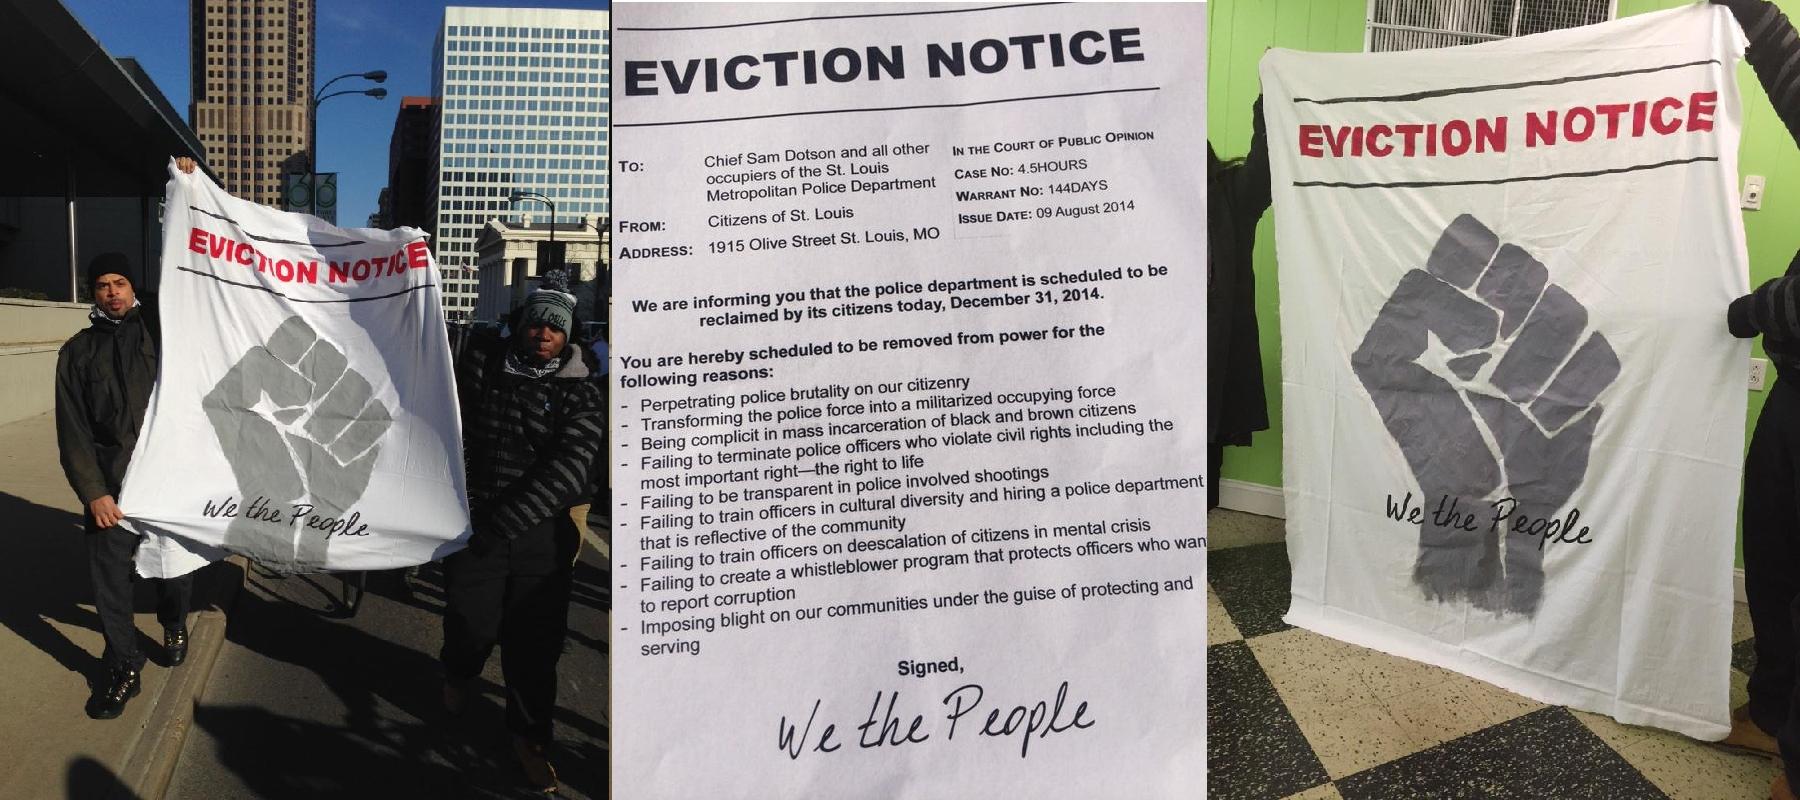 ferguson eviction